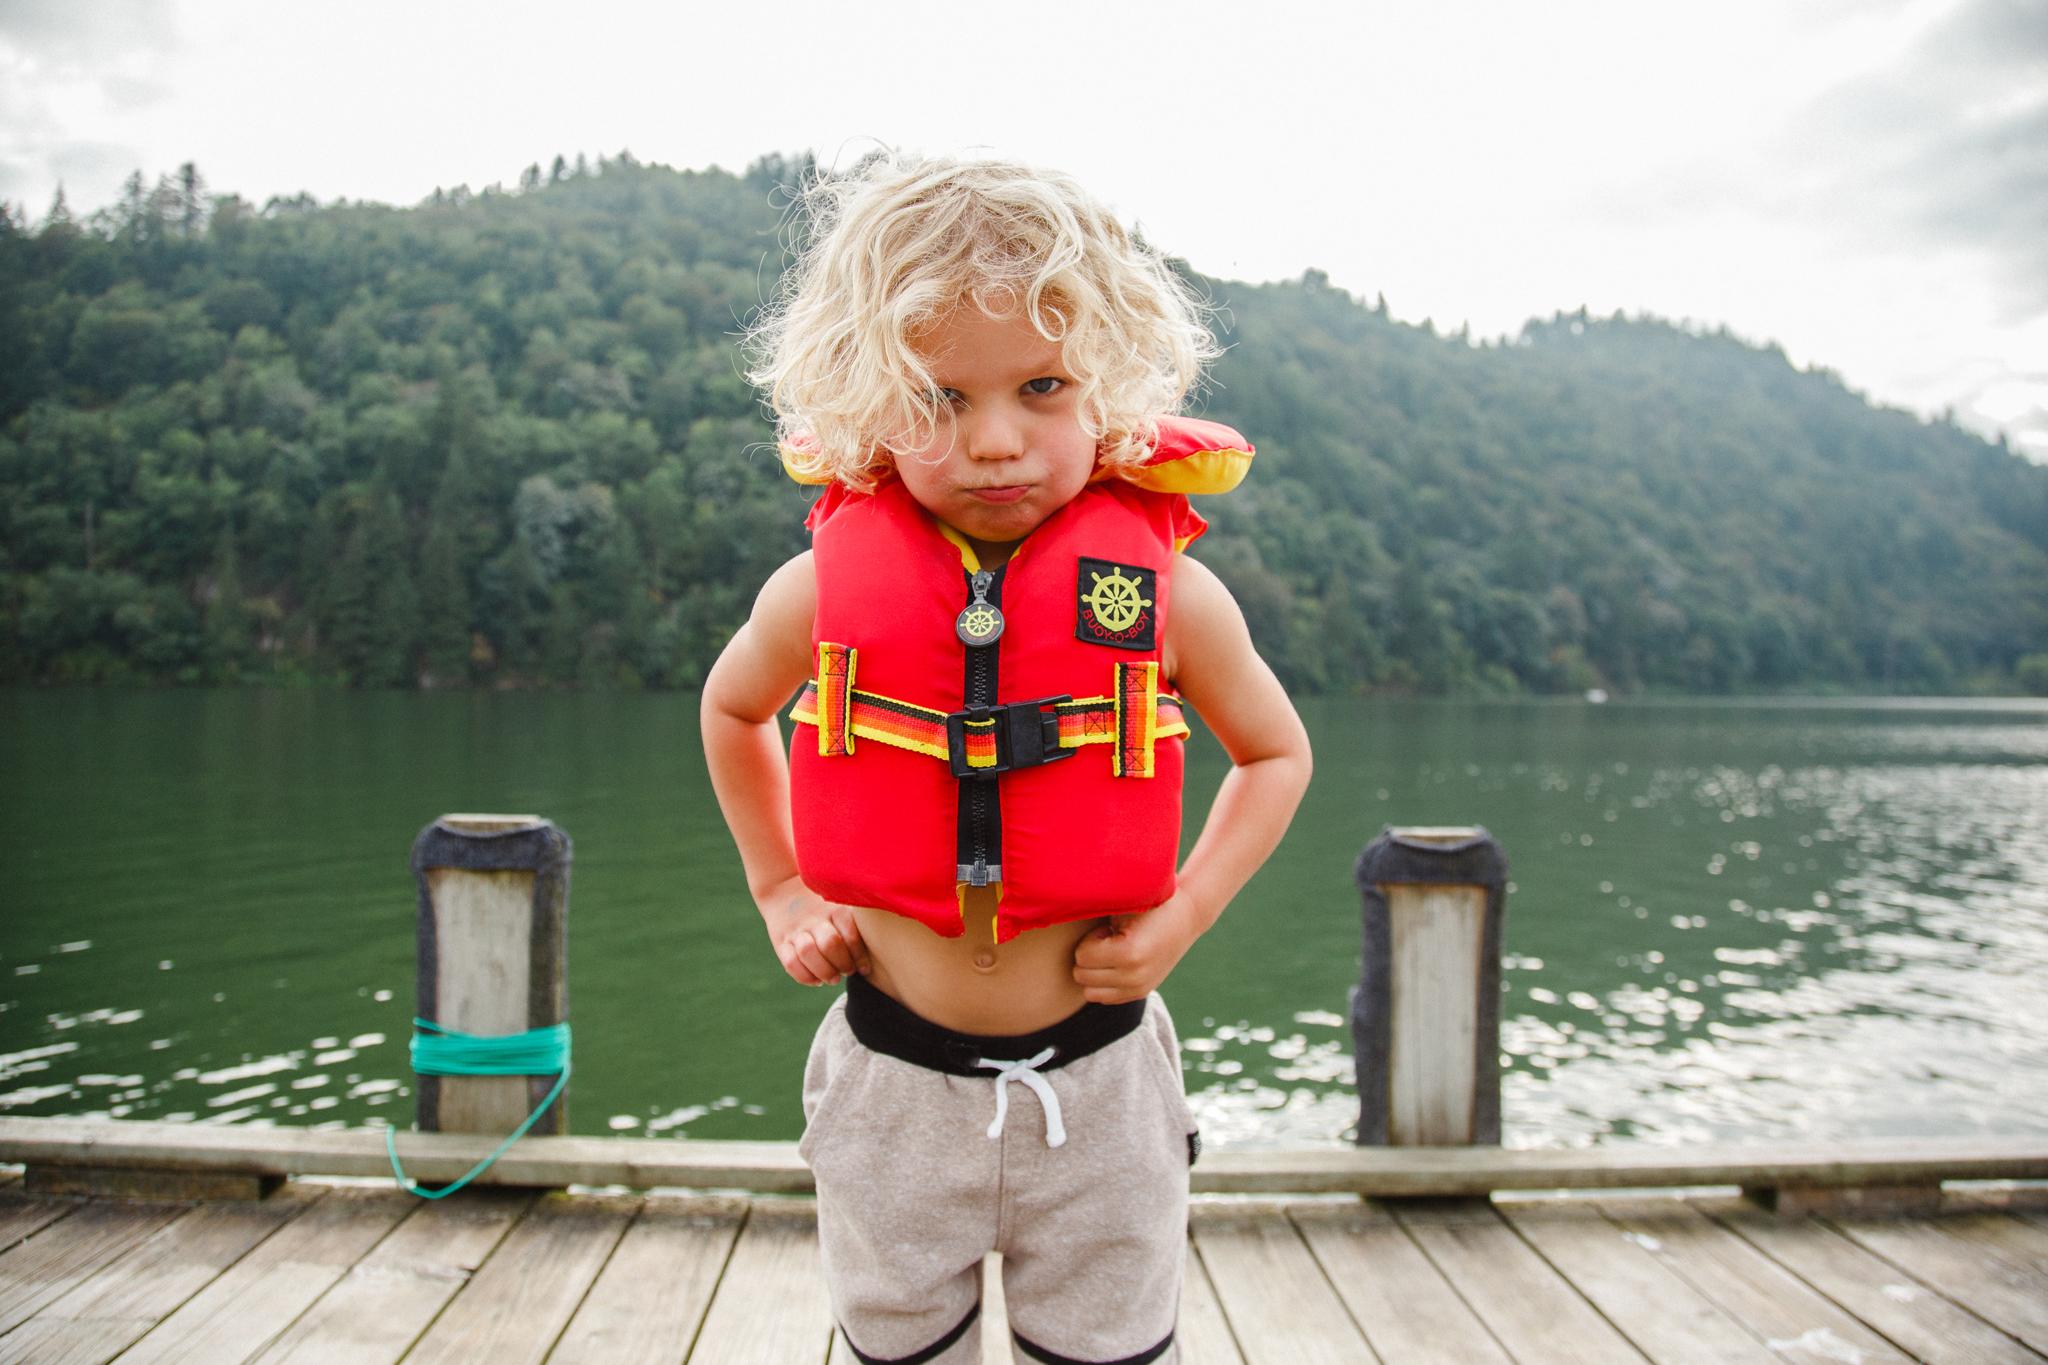 sully life jacket silly face hatzic-1.jpg